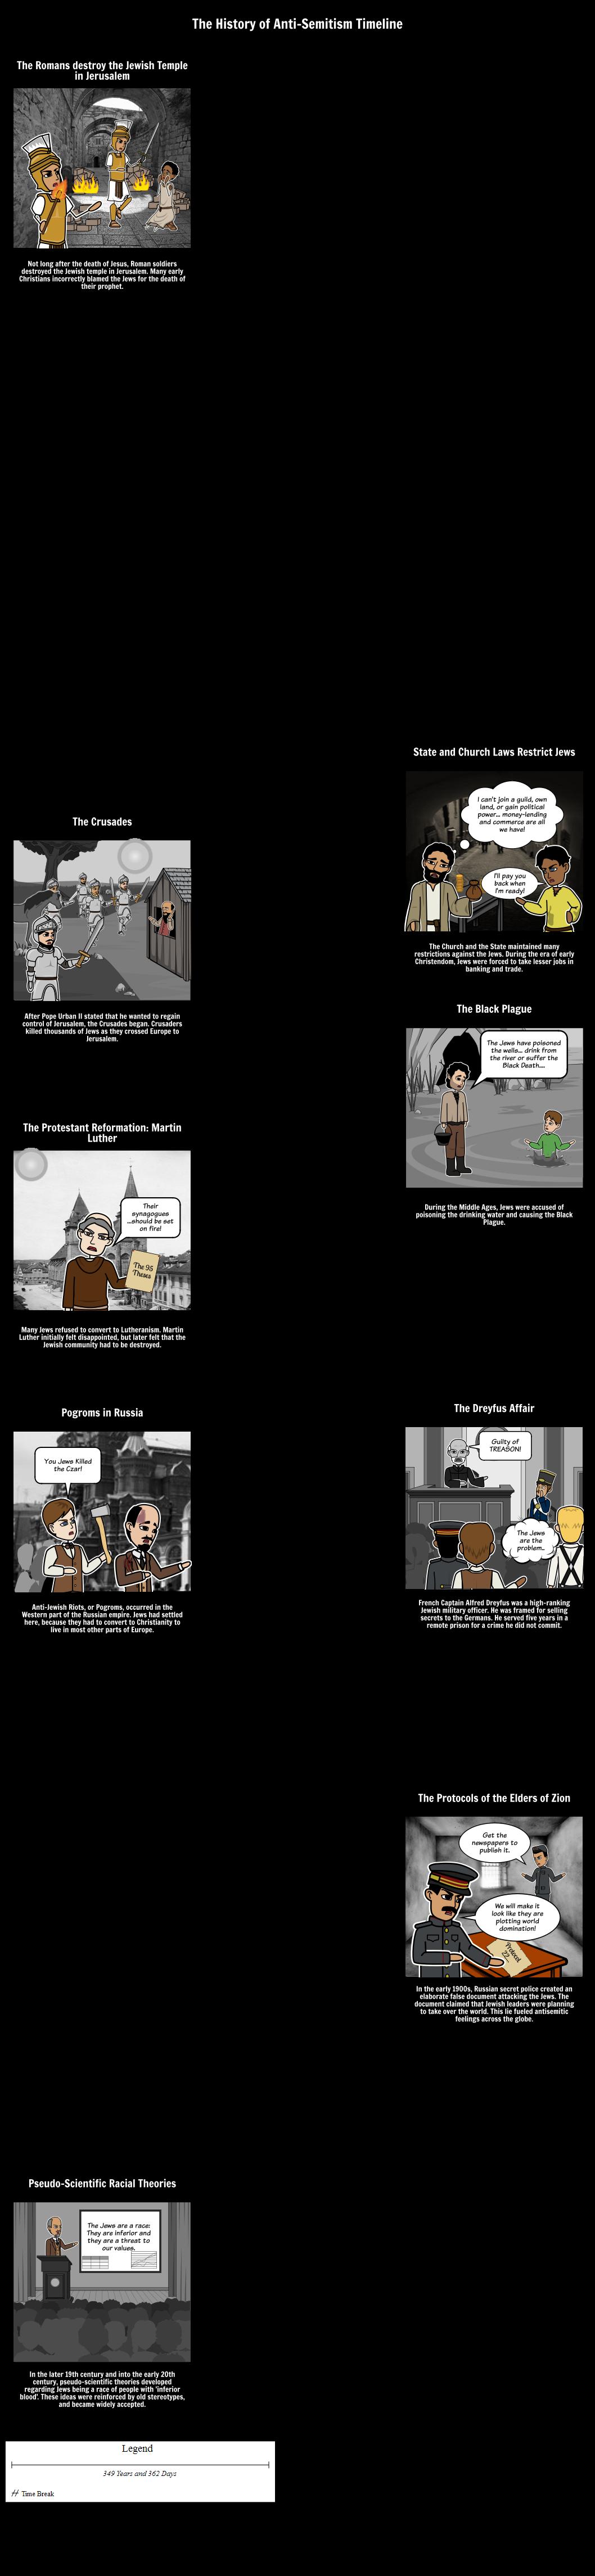 history of anti semitism timeline